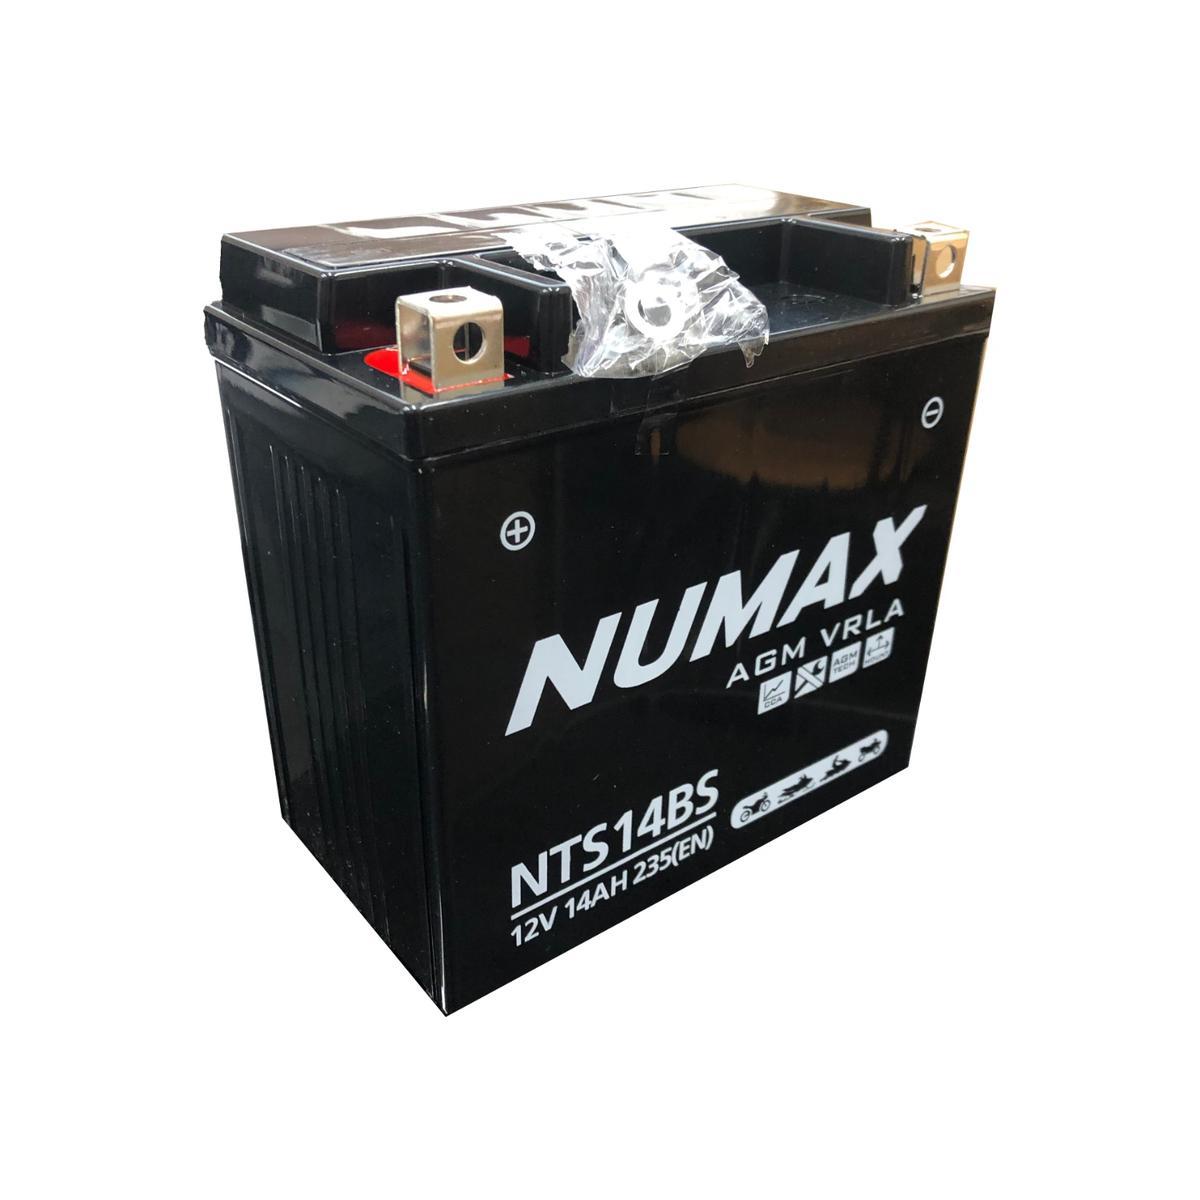 Numax NTS14BS 12v Motorbike Bike Battery TRIUMPH 900cc Trophy YTX14-4